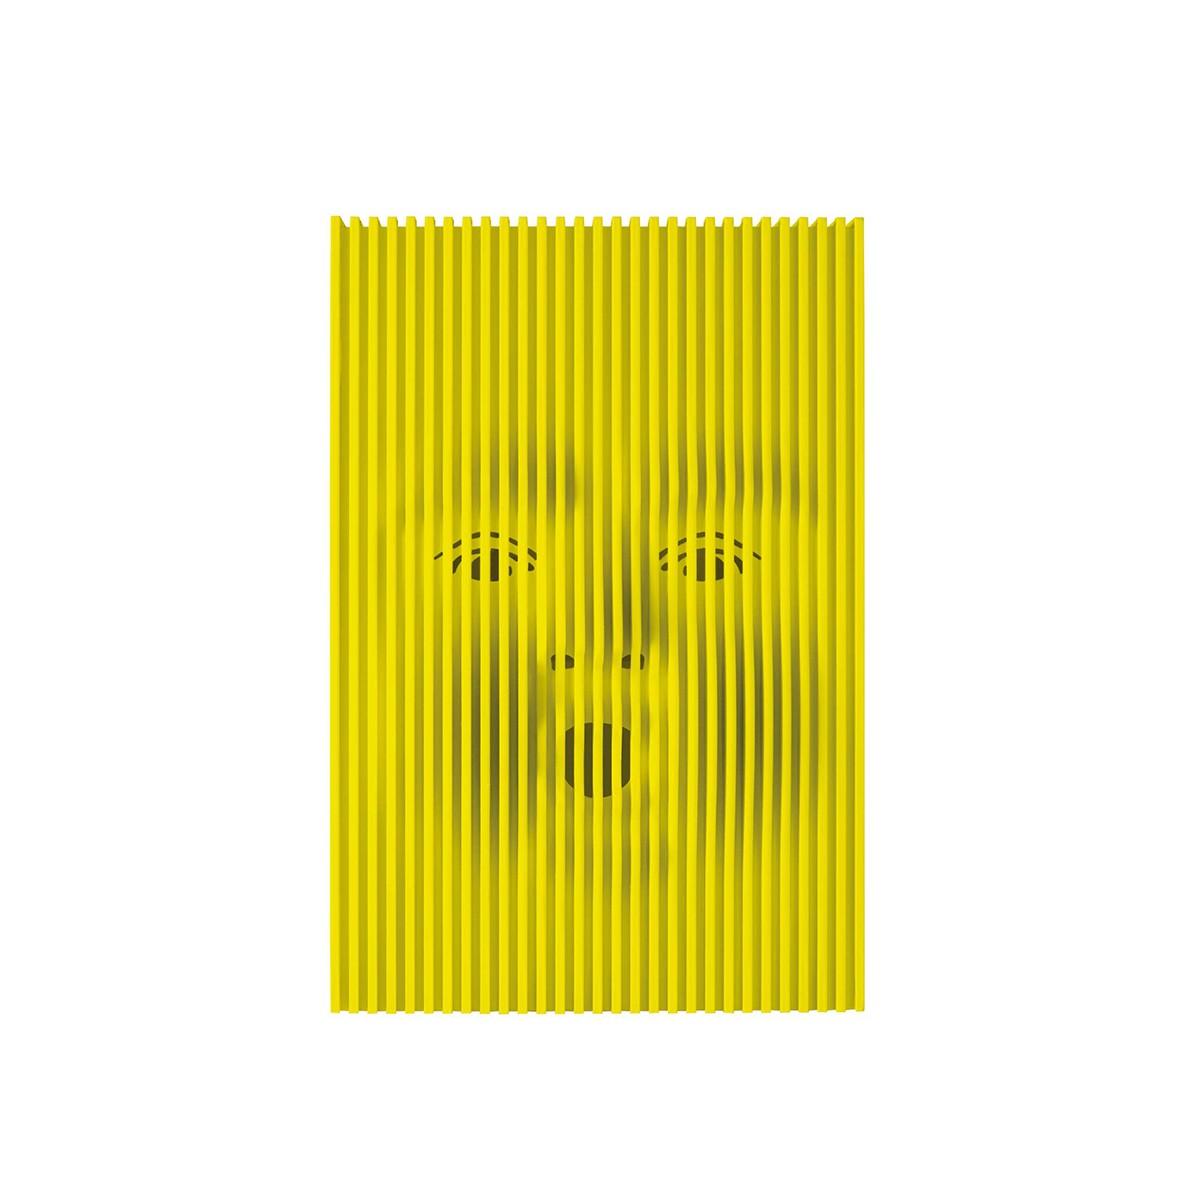 Rotaliana Eolo Tischleuchte, gelb